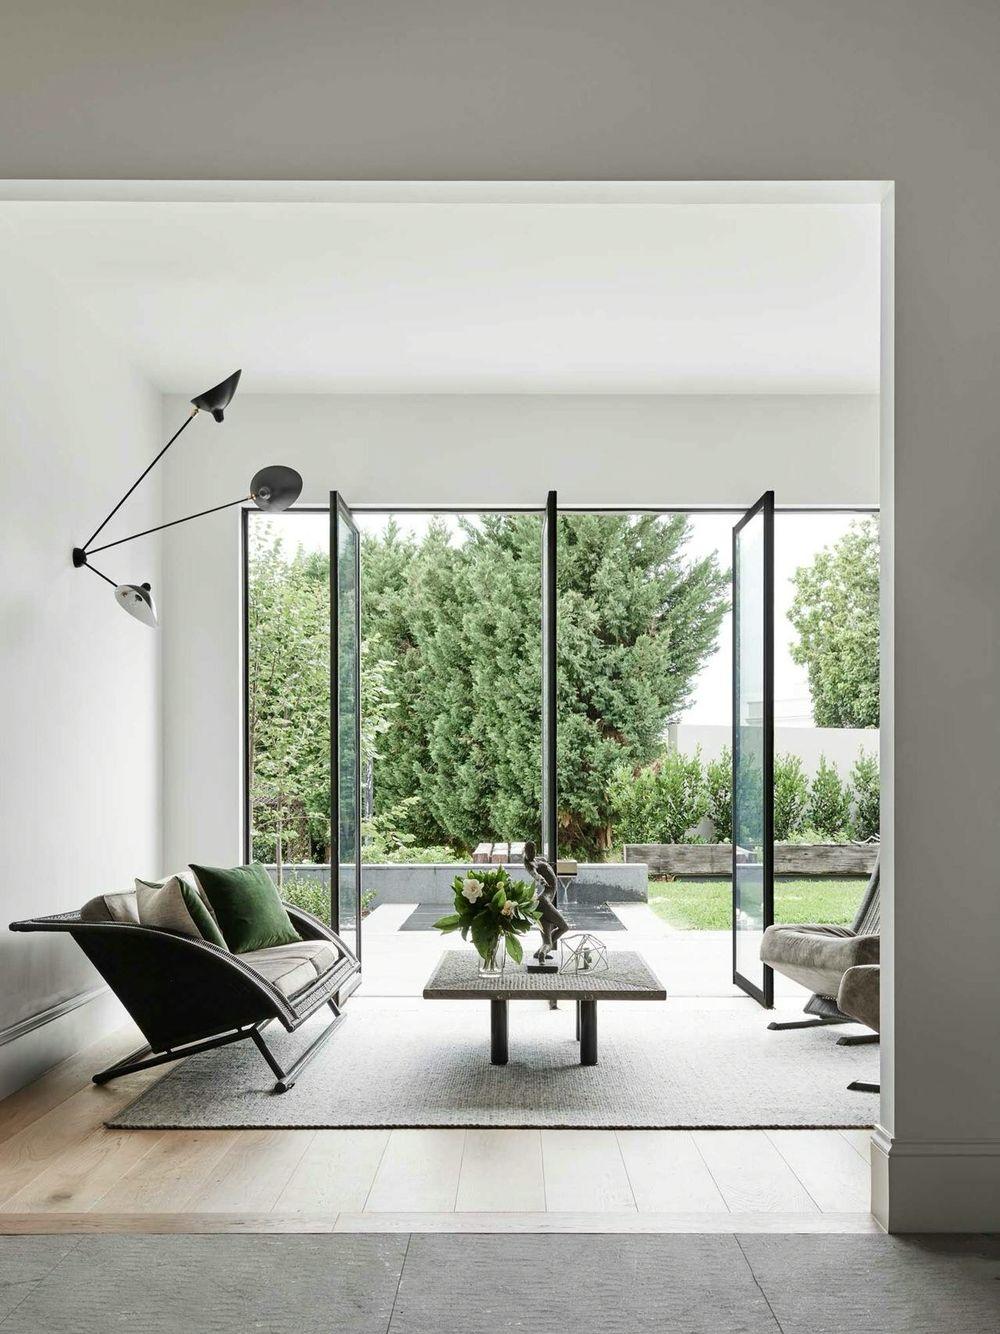 Glass Door Designs For Living Room Amazing Pinoscar Racso On Interieur & Huisjes  Pinterest  Living Design Decoration